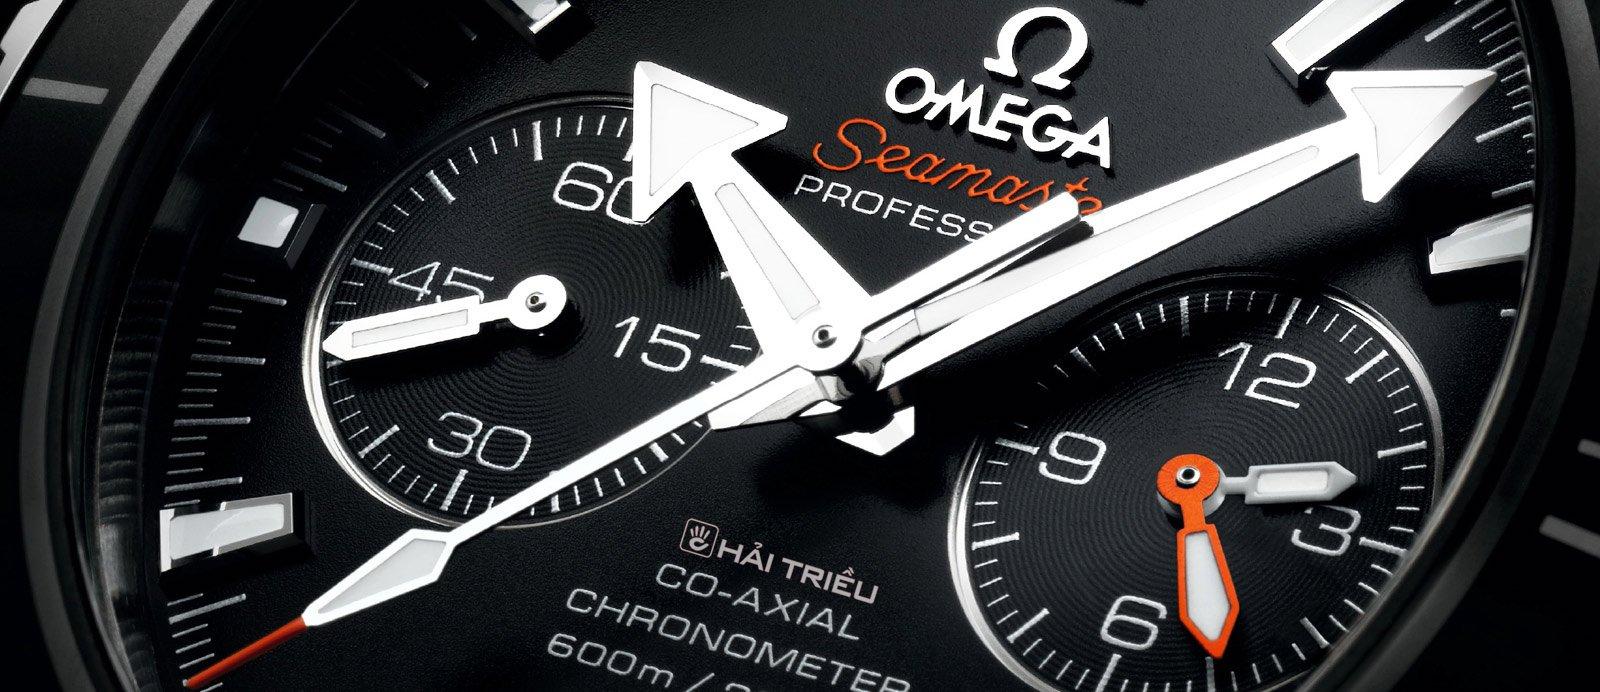 The nao la dong ho Chronometer va chung nhan COSC